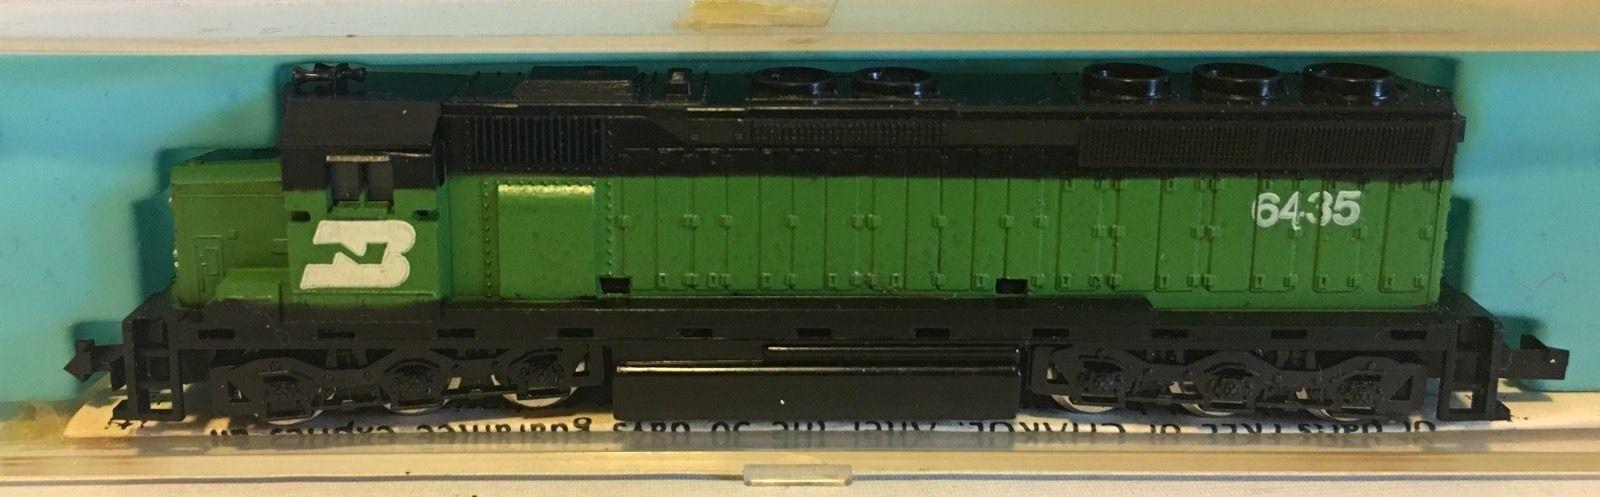 N Scale - Con-Cor - 2201-F - Locomotive, Diesel, EMD SD45 - Burlington Northern - 6435